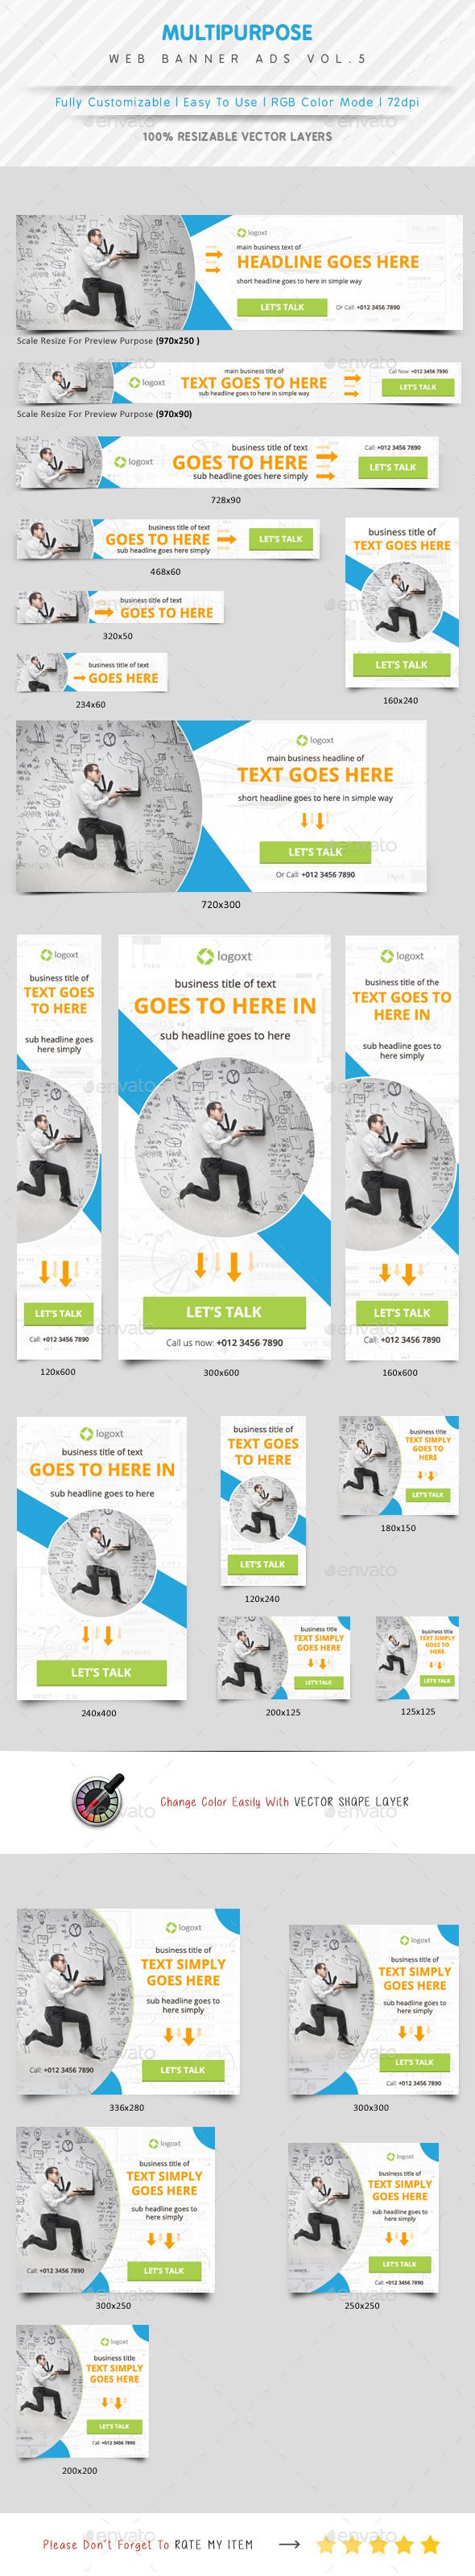 Multipurpose Web Banner Ads Template #design #ads Download: http://graphicriver.net/item/multipurpose-web-banner-ads/12324022?ref=ksioks